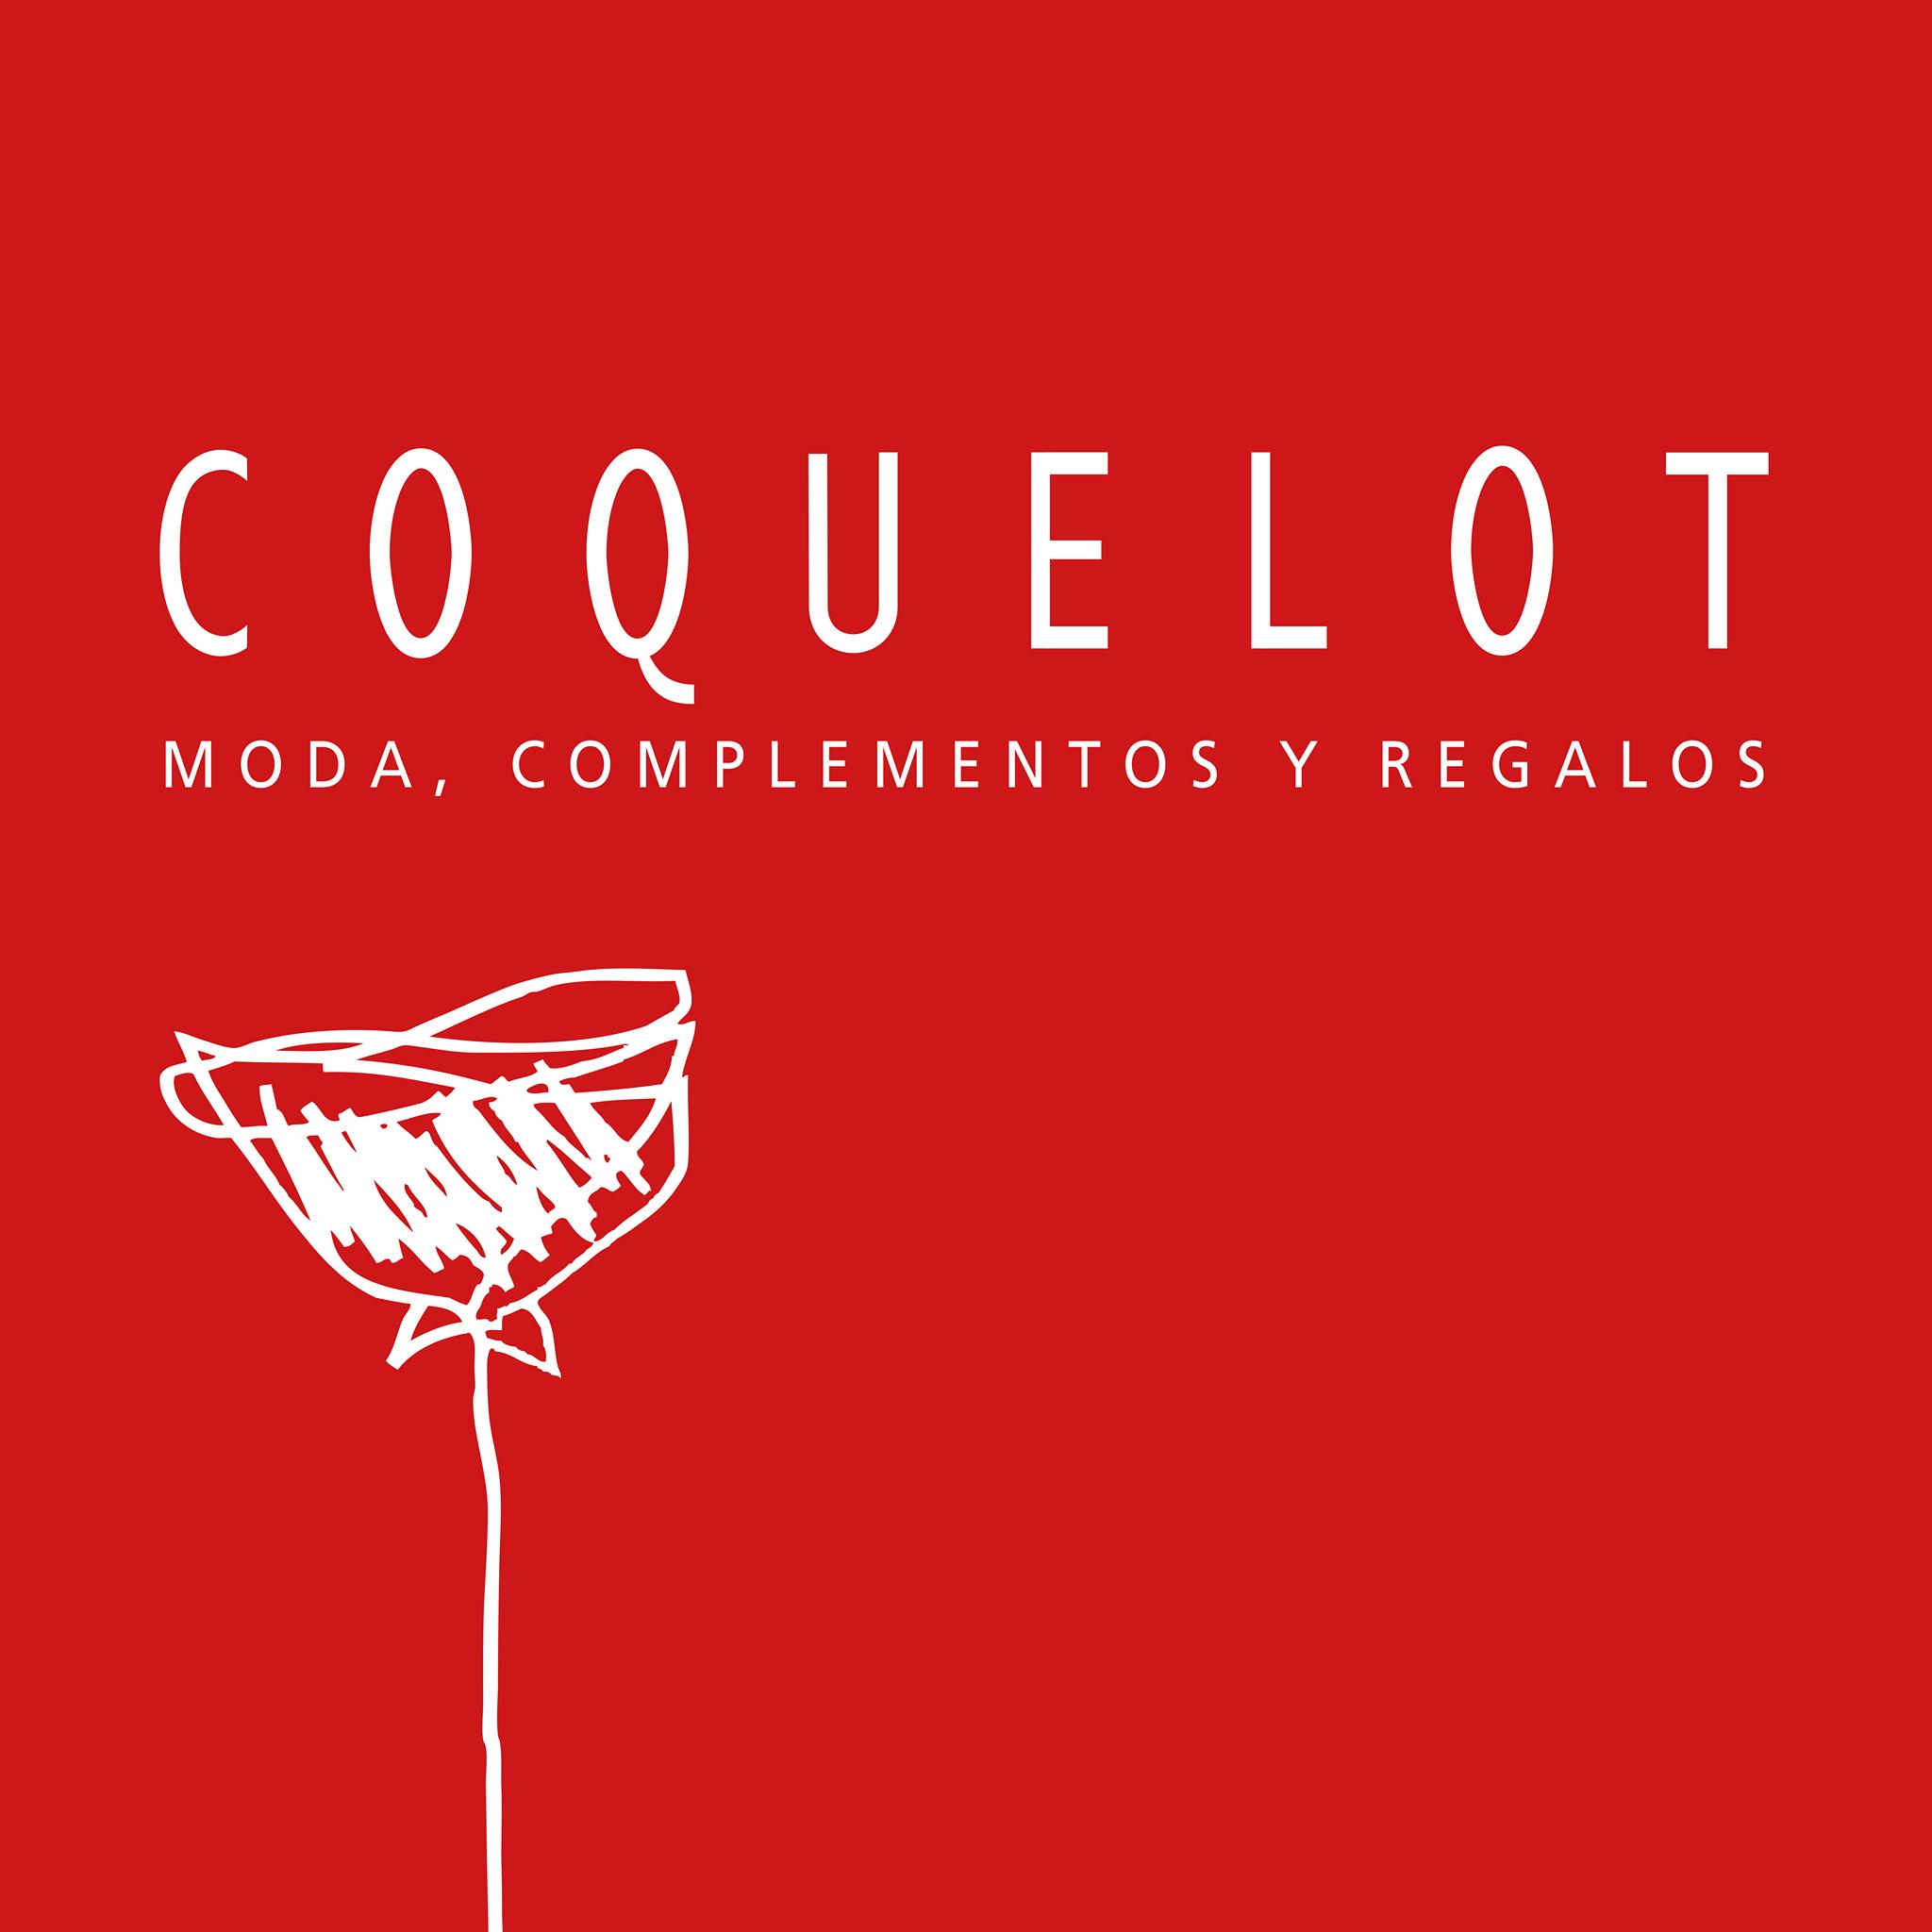 Coquelot